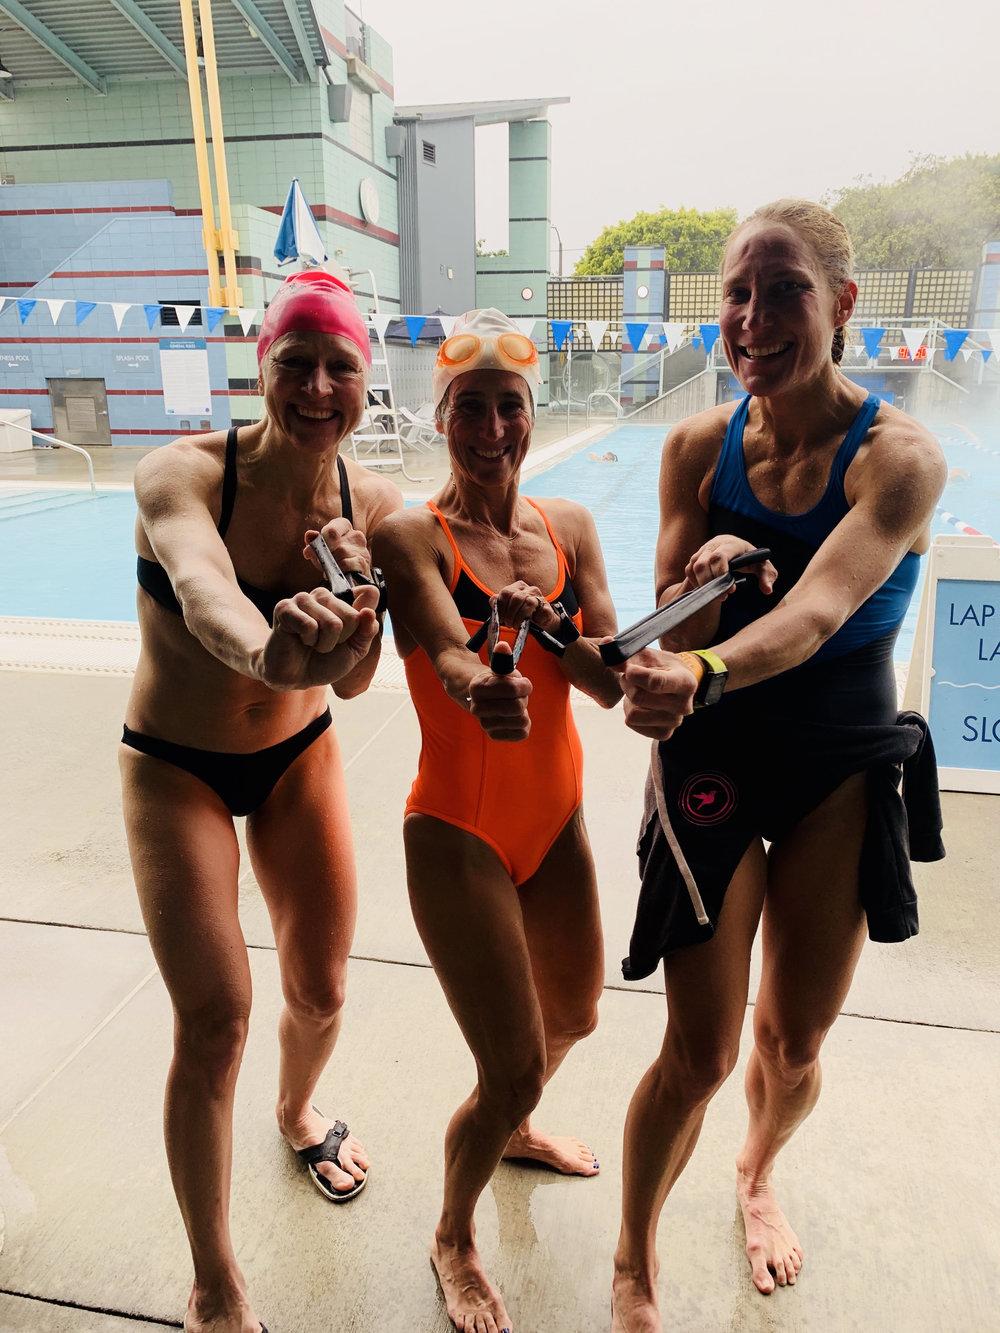 Post Breakthrough Swim, From left, my teammate's Kat Zeiler, Lynne fielder, and a tall lady. Photo courtesy of Jenn Aronson.